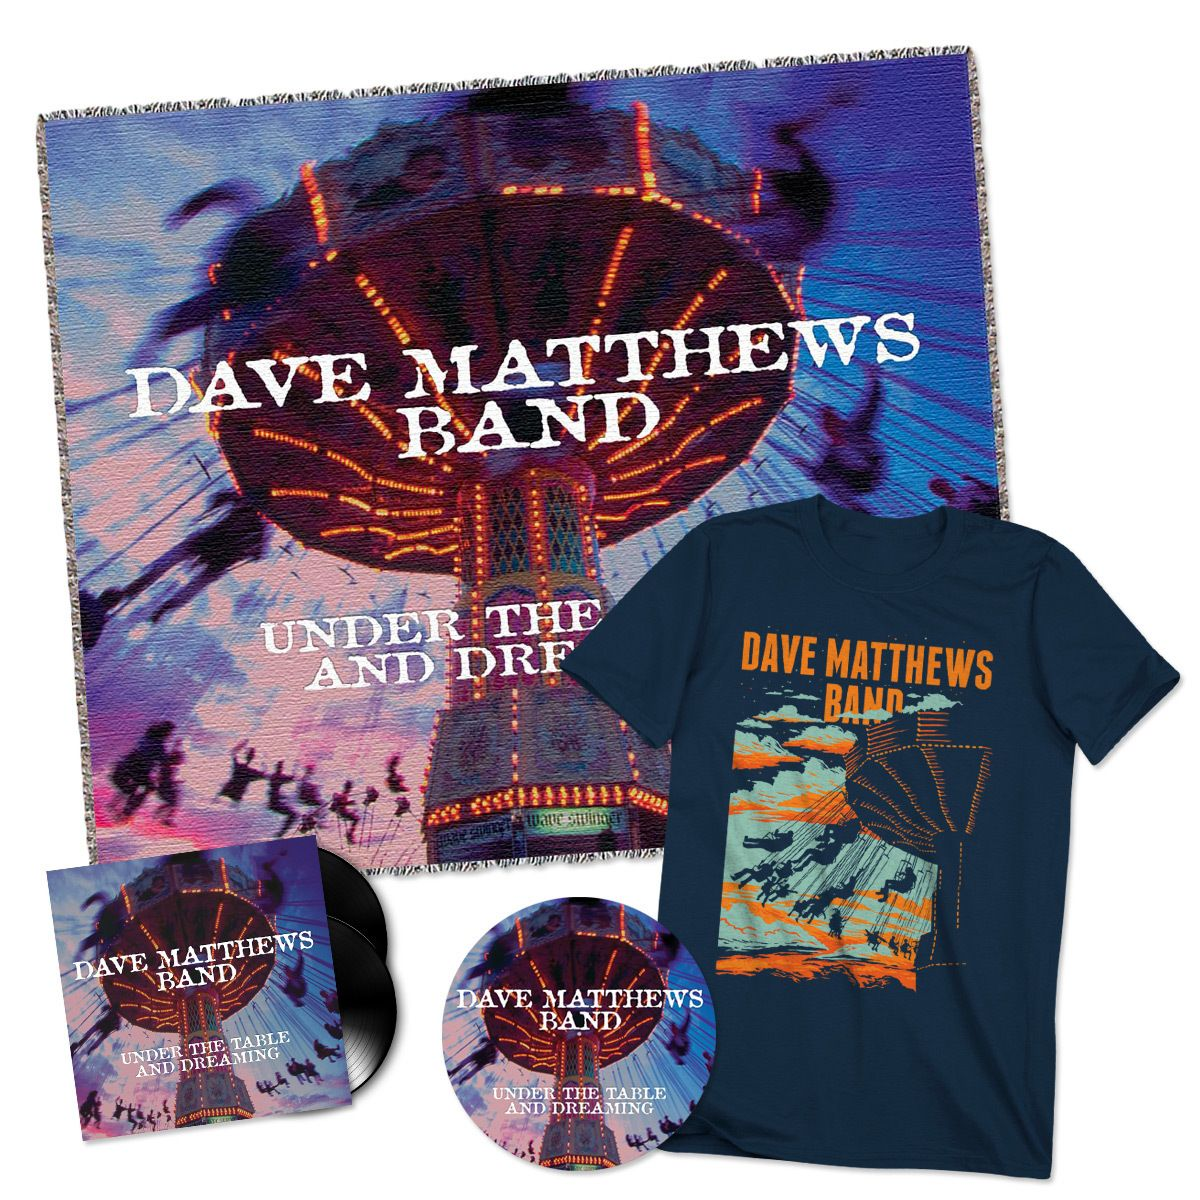 Dave Matthews Band Official Store